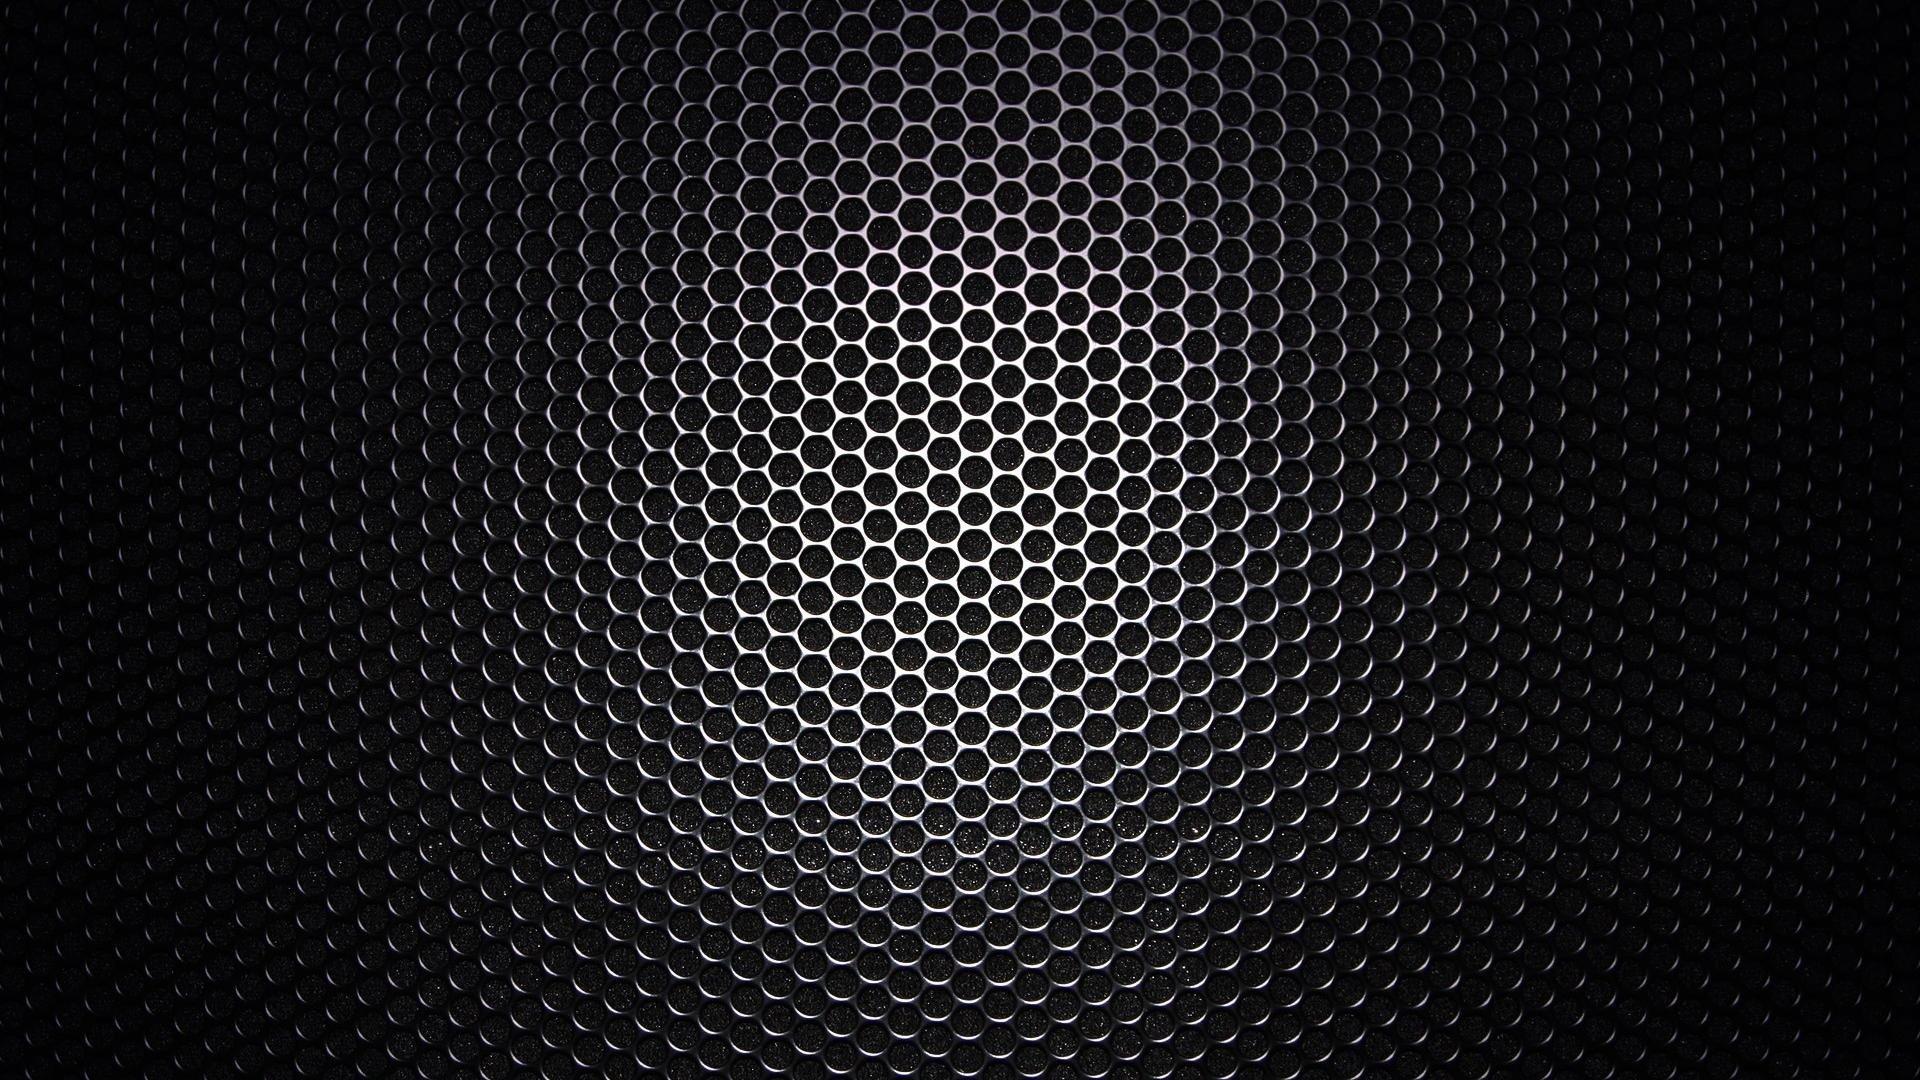 wallpaperswidecom black hd desktop wallpapers for 4k